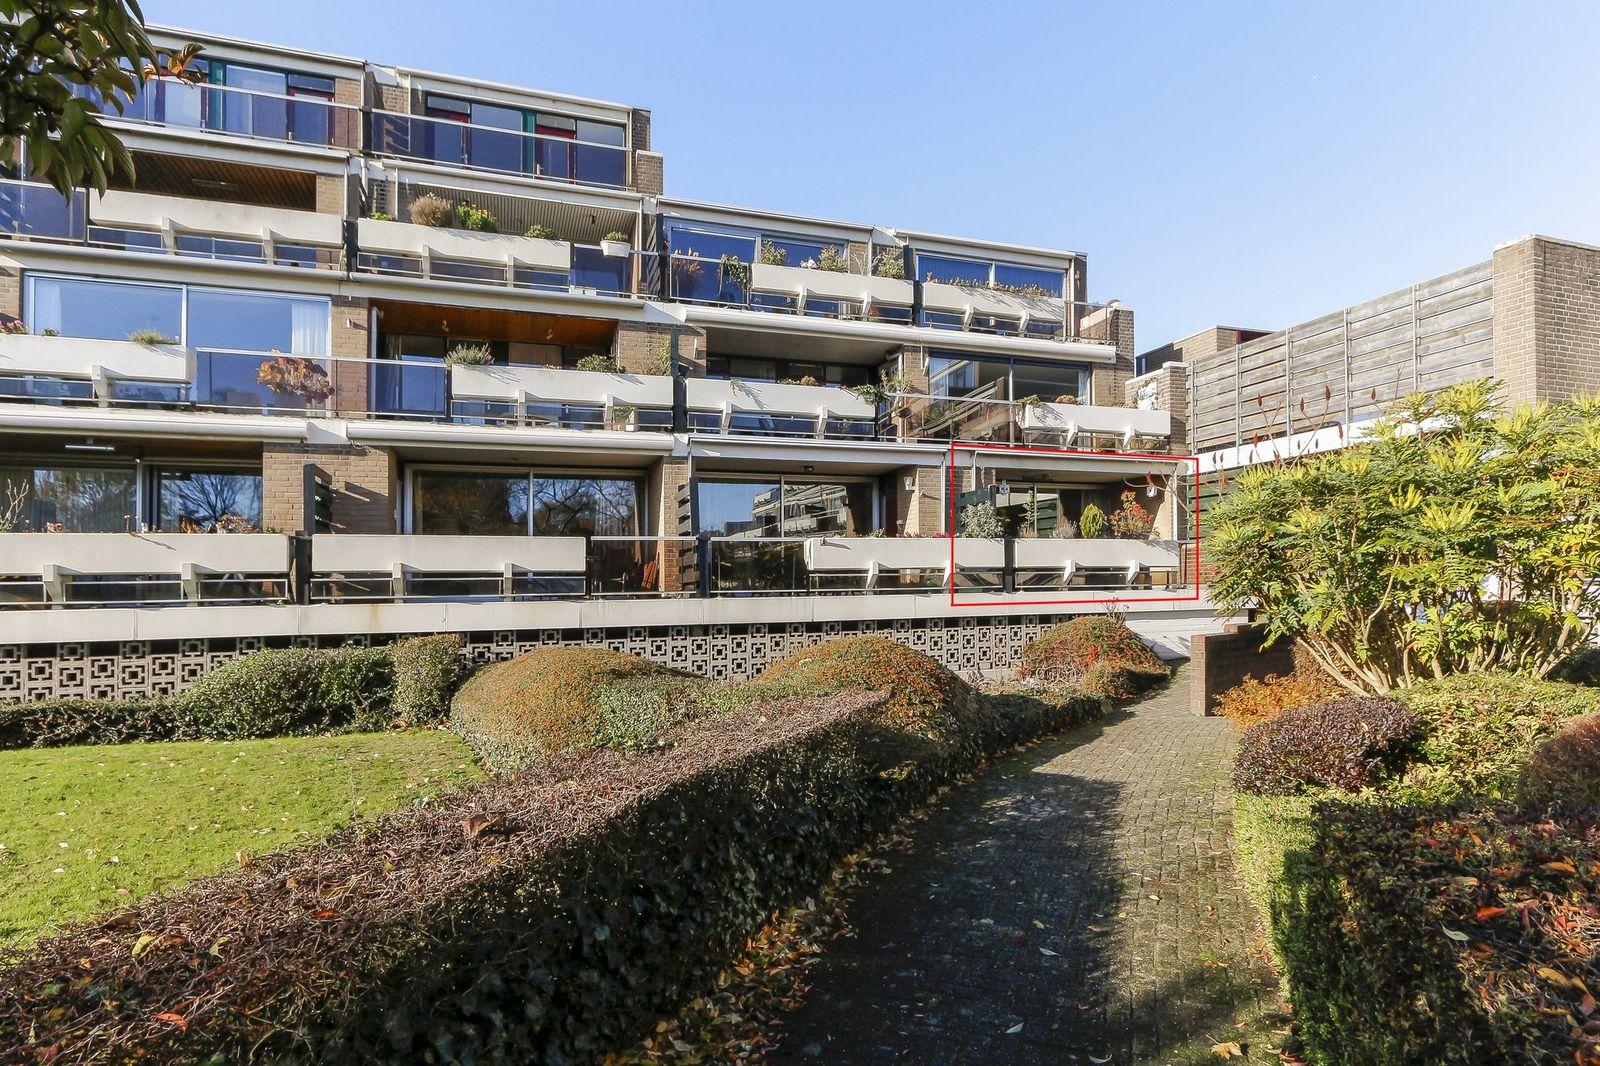 Toutenburg 38, Dordrecht